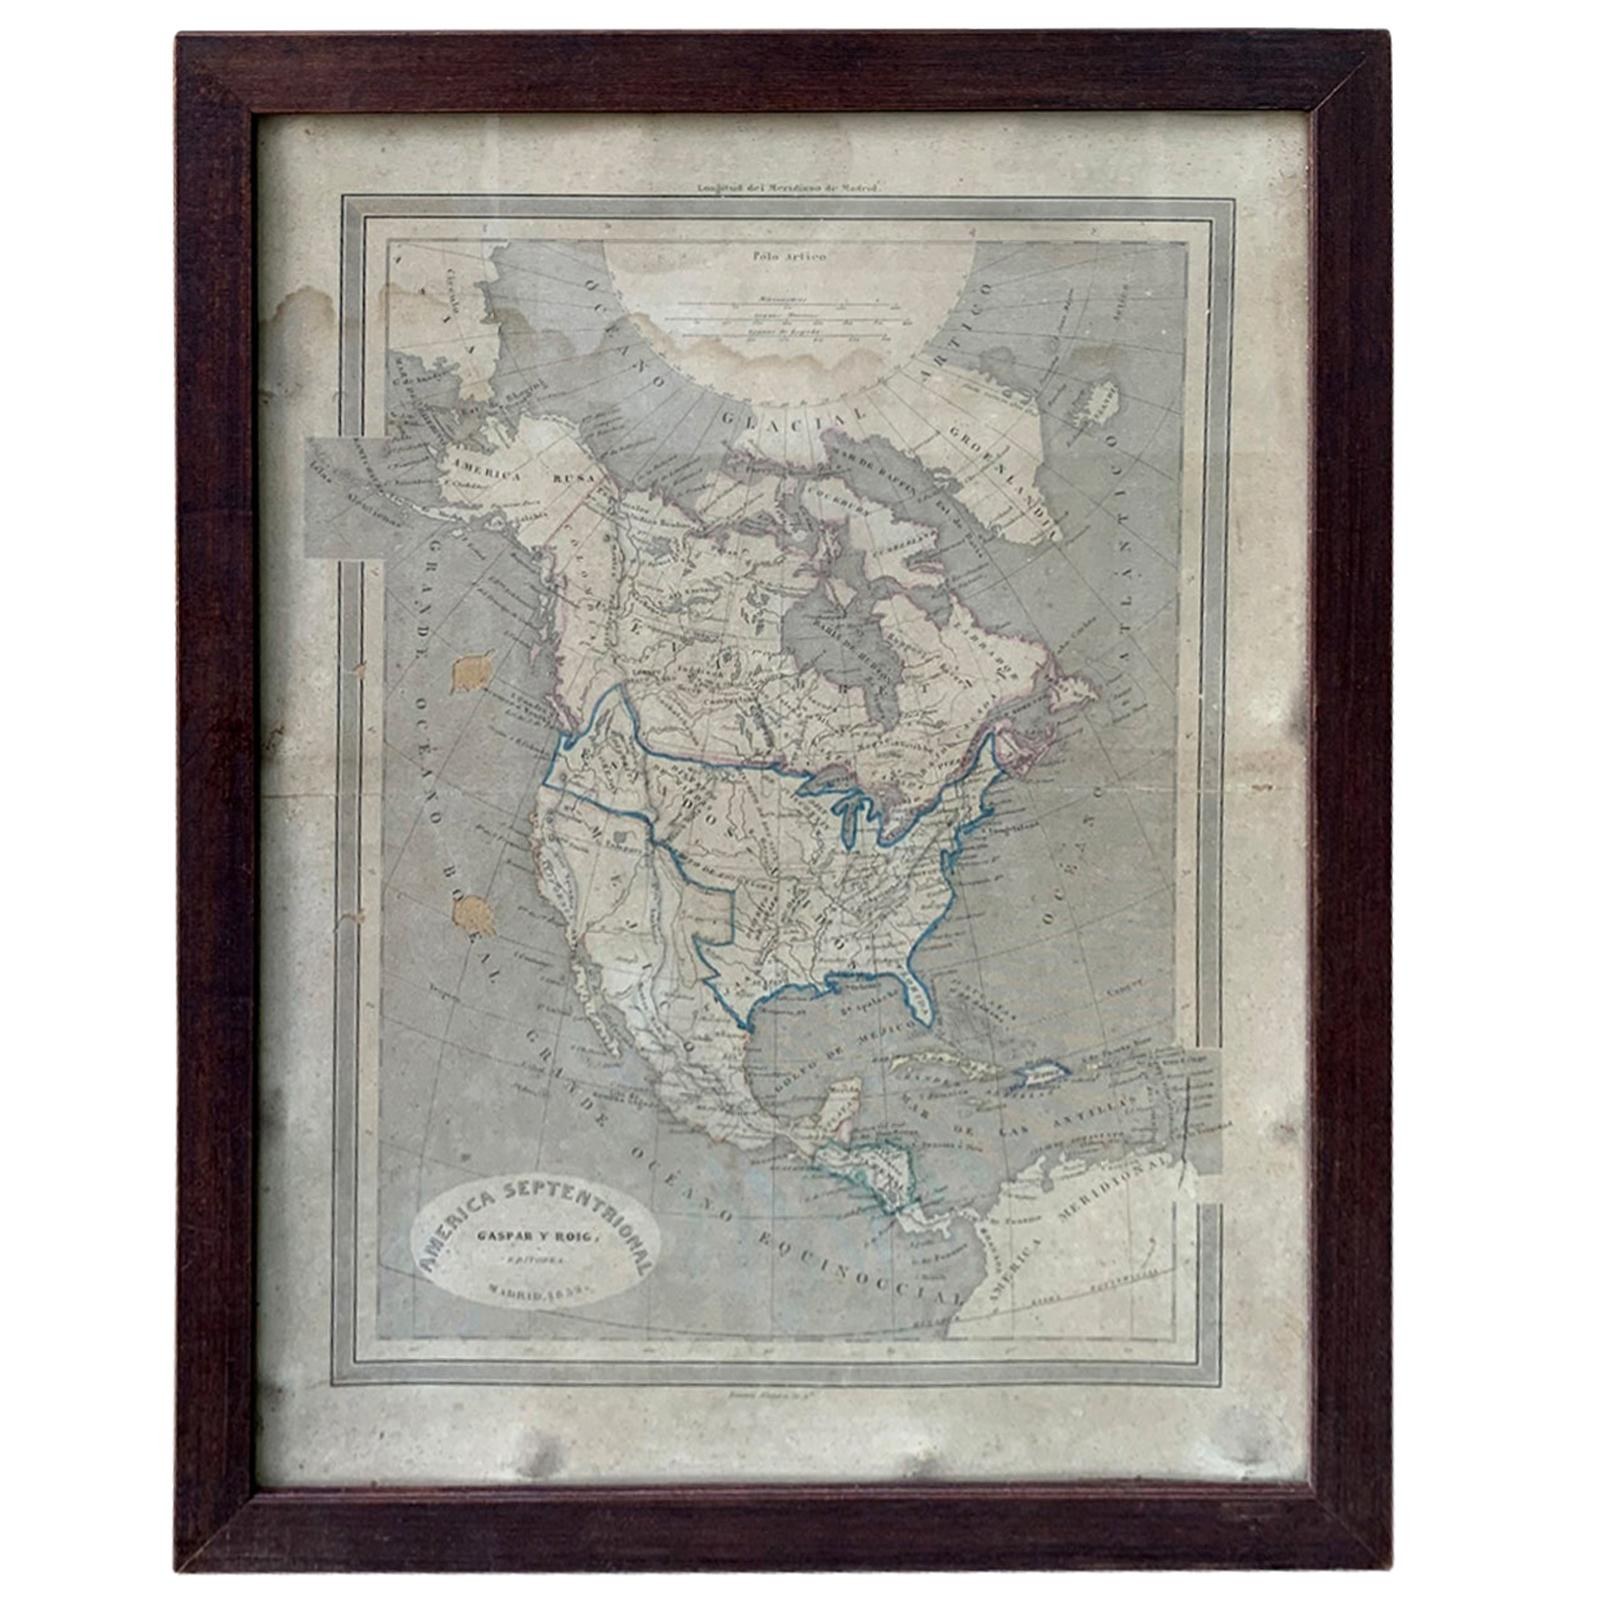 19th Century Spanish Engraved Map of America by Gaspar Y Roig, Madrid